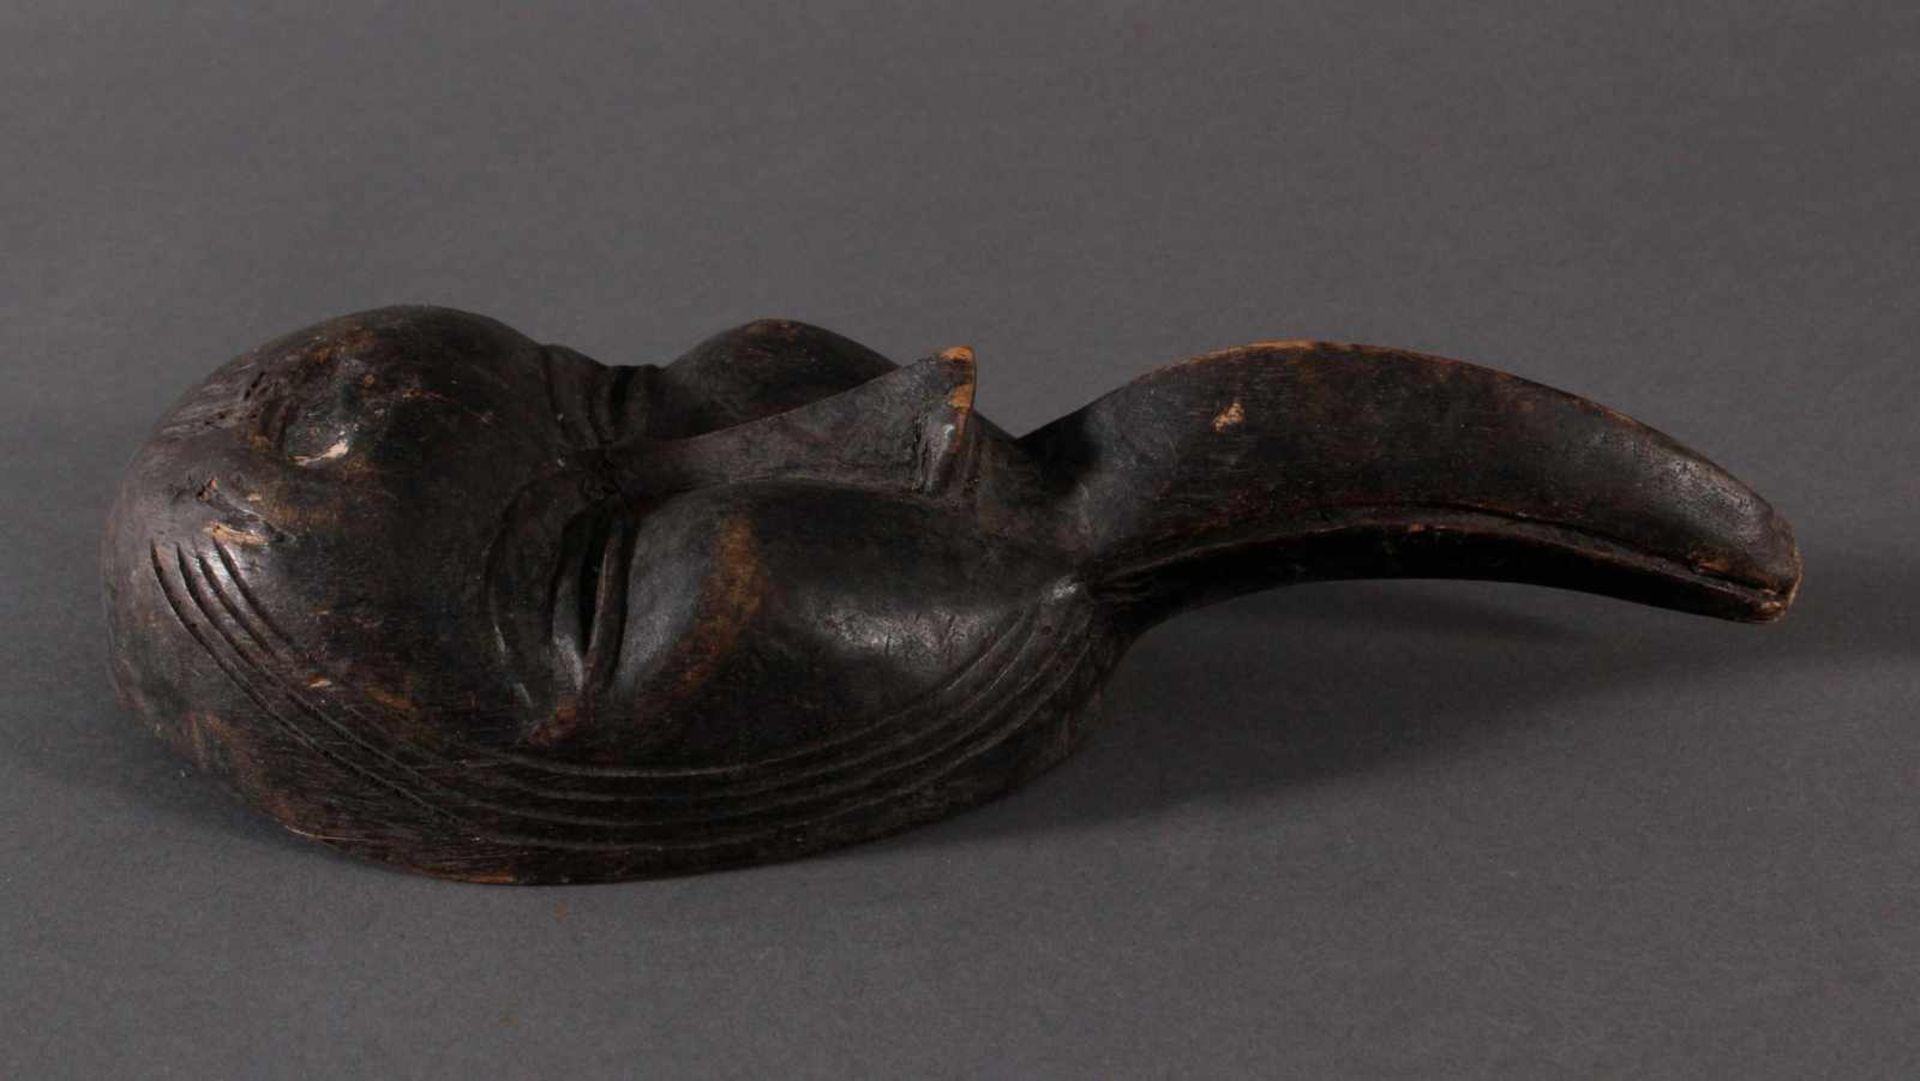 Antike Maske, Dan, Liberia 1. Hälfte 20. Jh.Holz geschnitzt, dunkle Patina, Schnabelmaske, ca. 6 x - Bild 2 aus 6